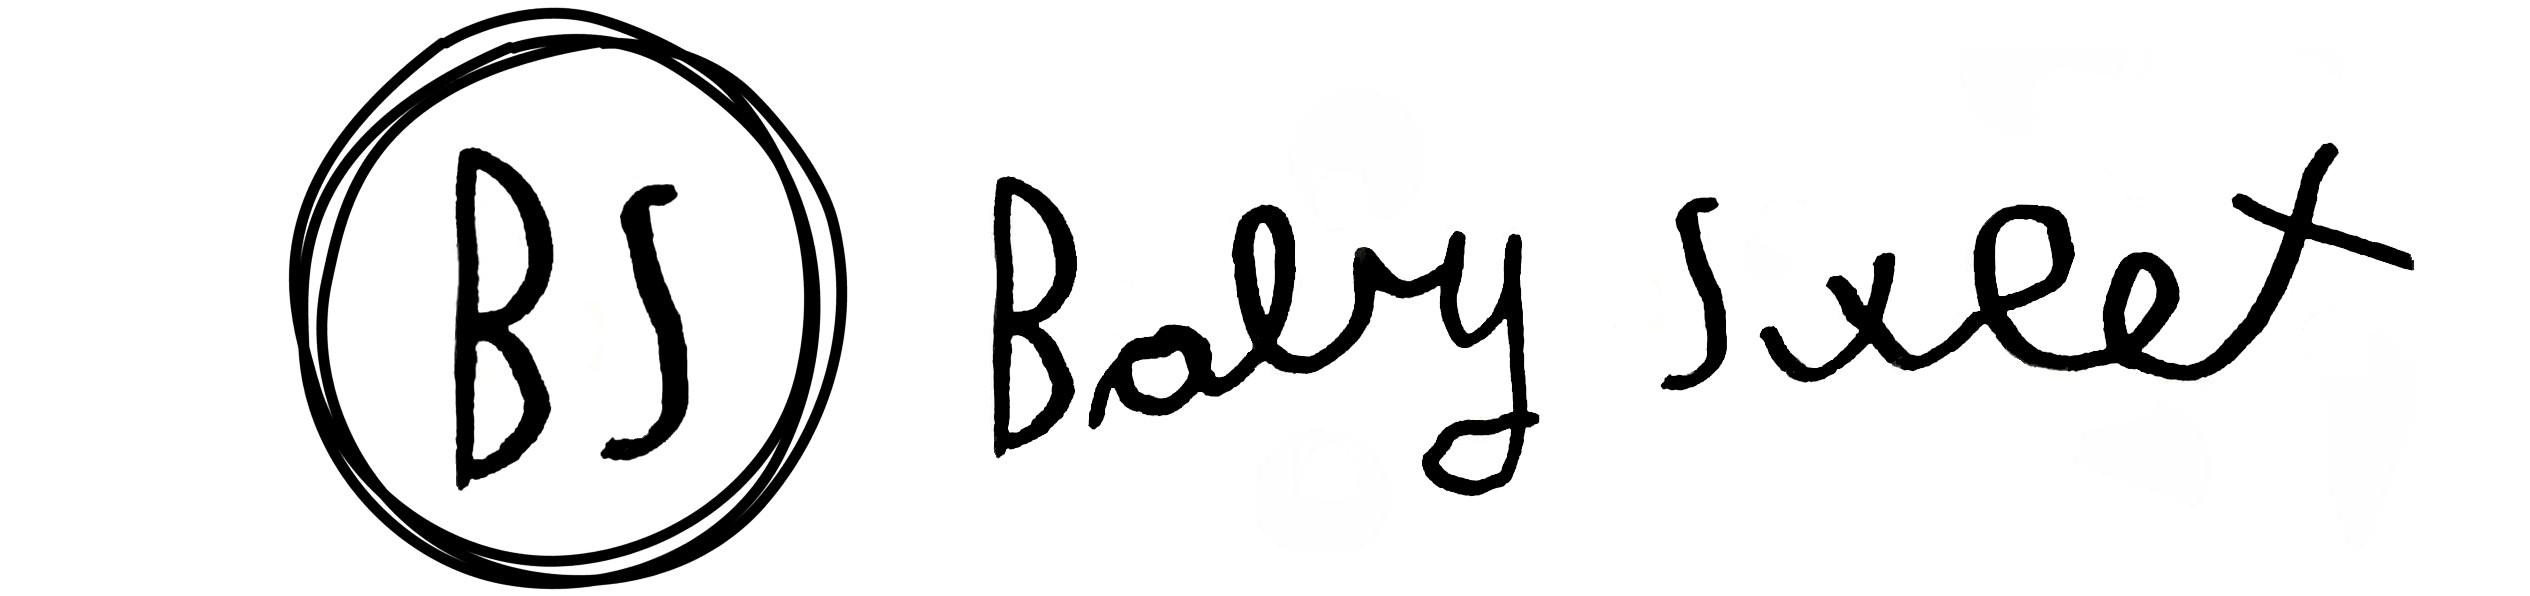 BABY SWEET